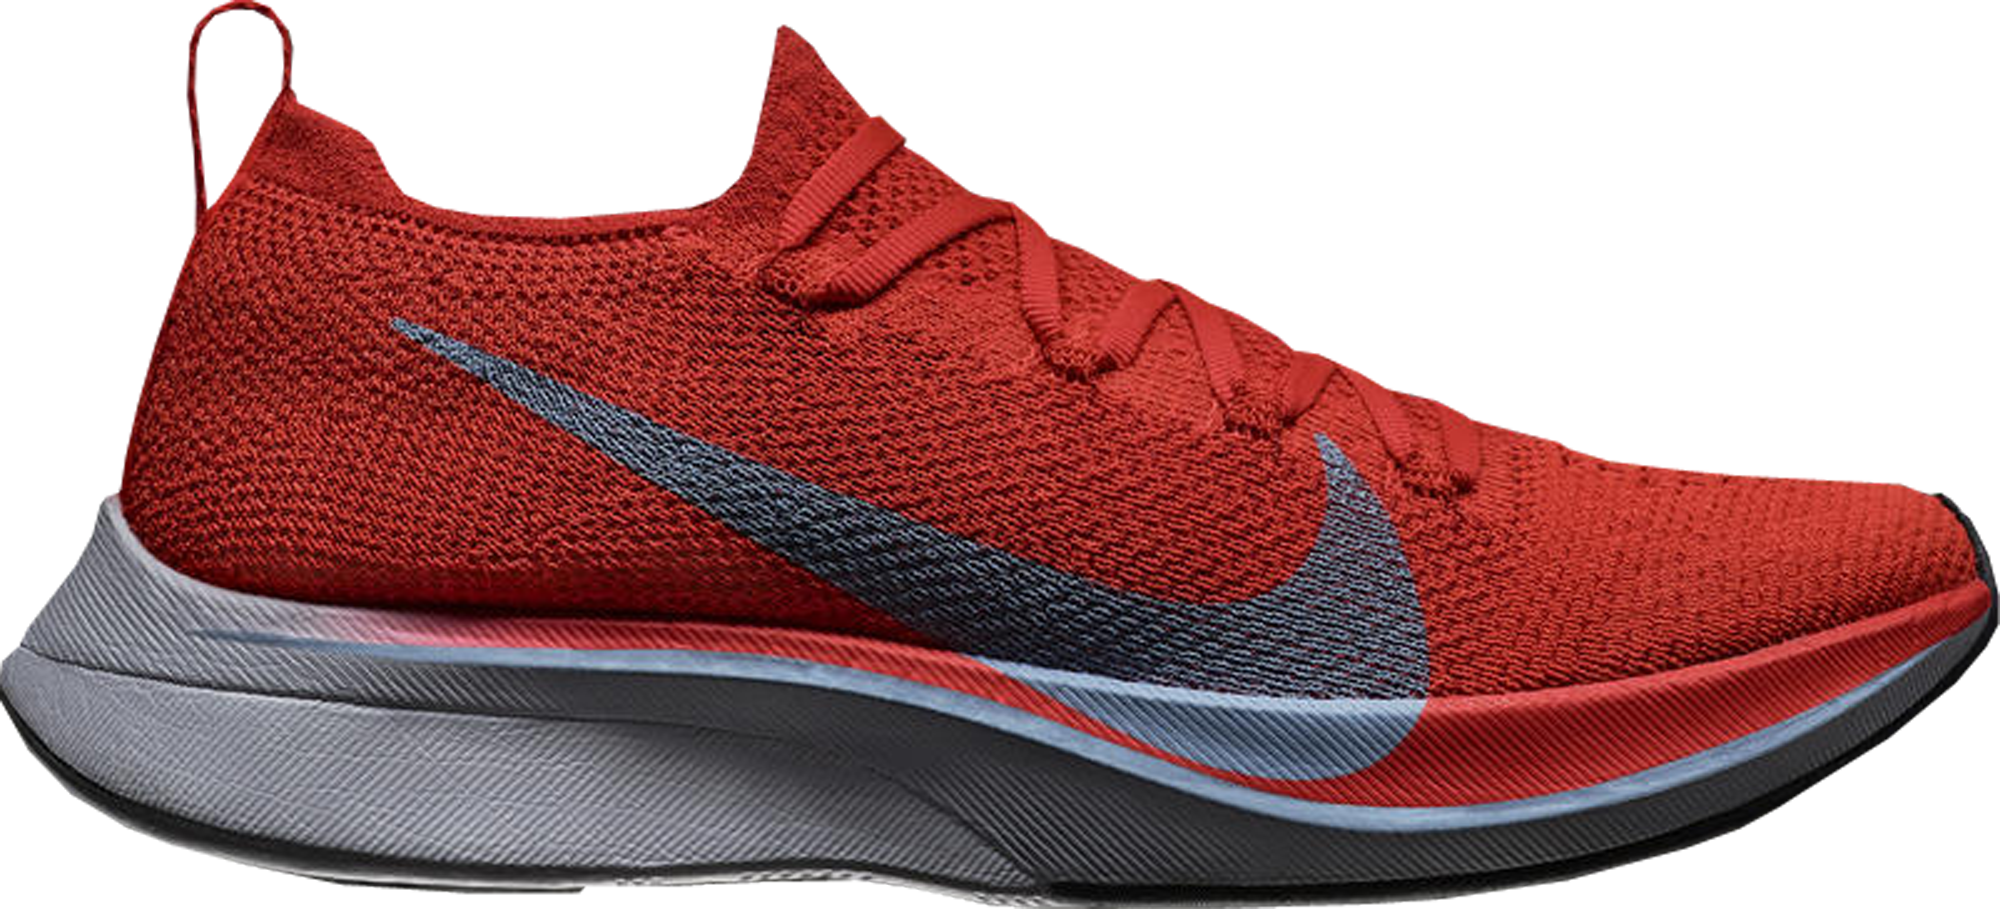 Nike Zoom VaporFly 4% Flyknit Bright